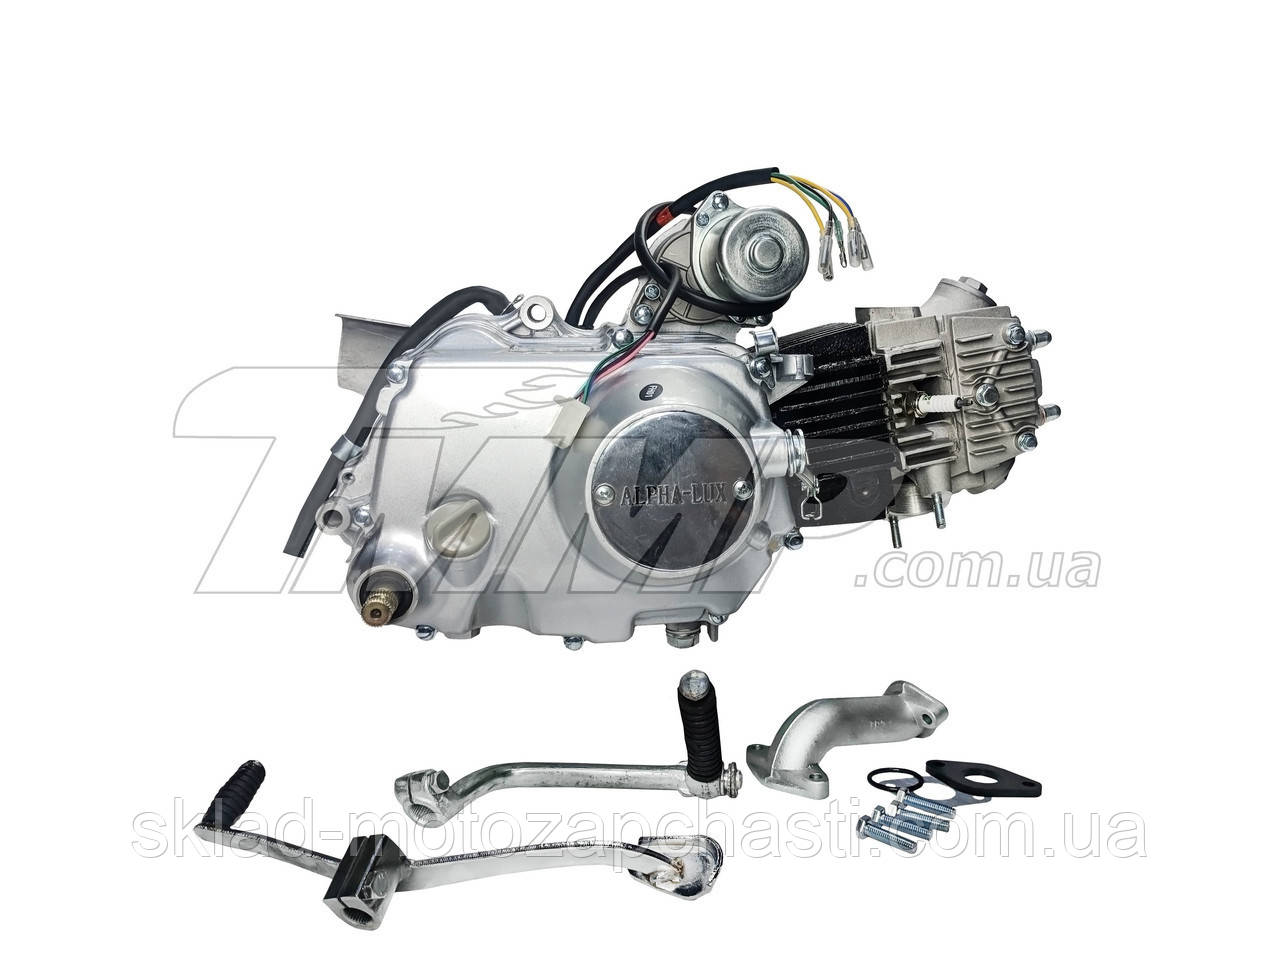 Двигун Альфа / Дельта-110см3 52,4 мм АЛЬФА ЛЮКС механіка